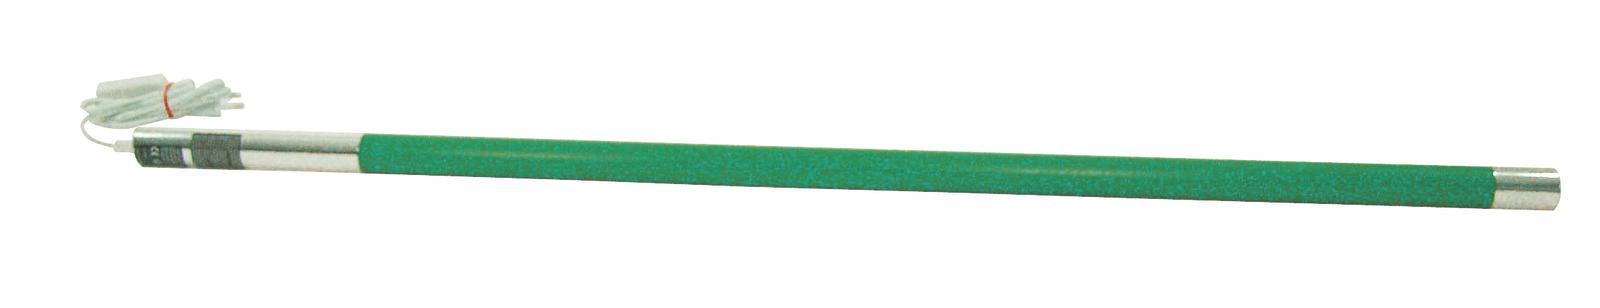 EUROLITE Leuchtstab T5 20W 105cm grün